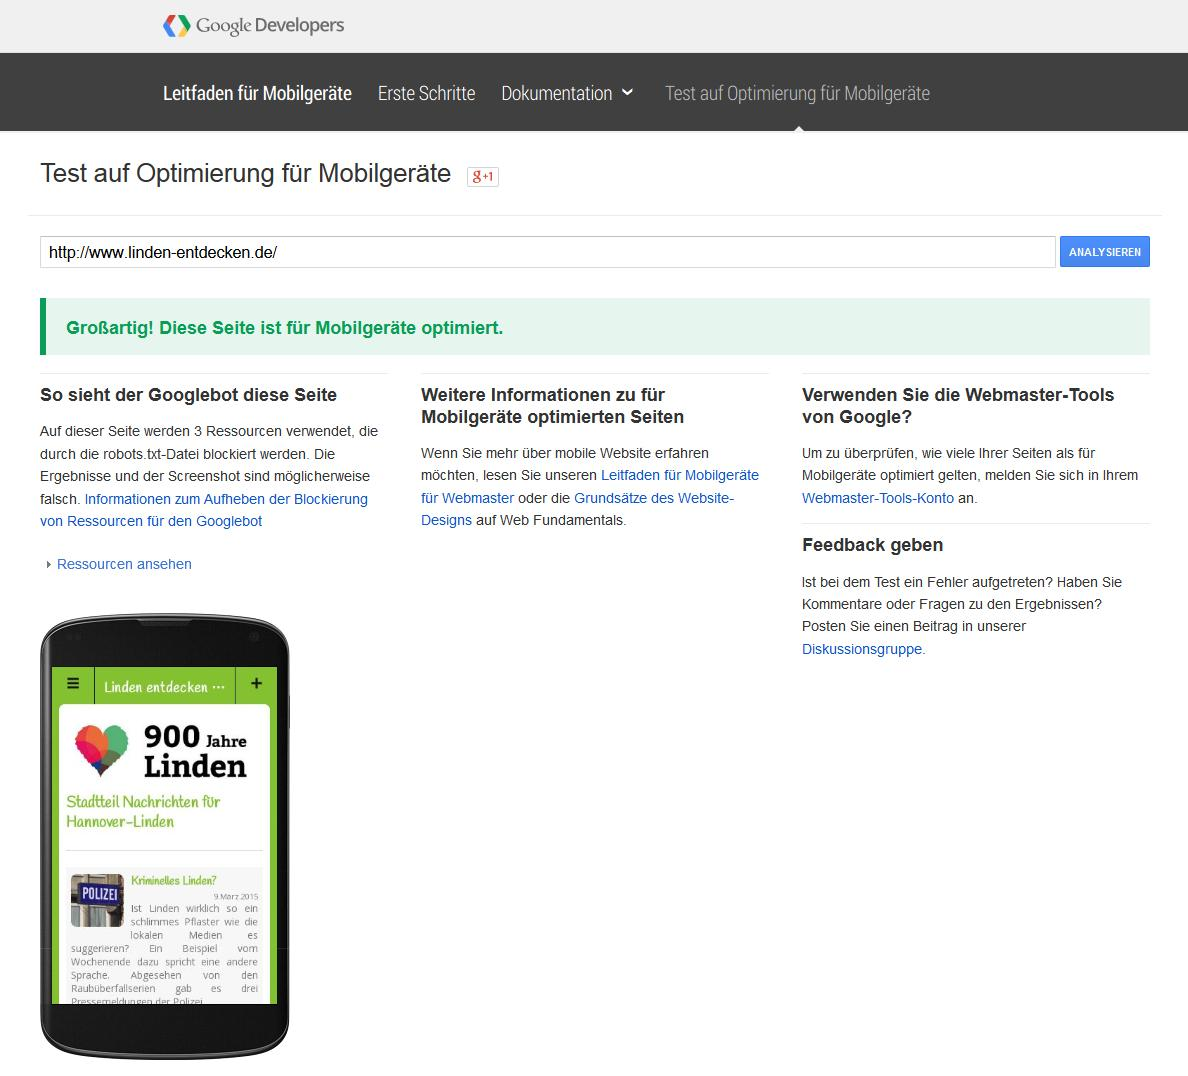 www.Linden-entdecken.de für Mobilgeräte optimiert